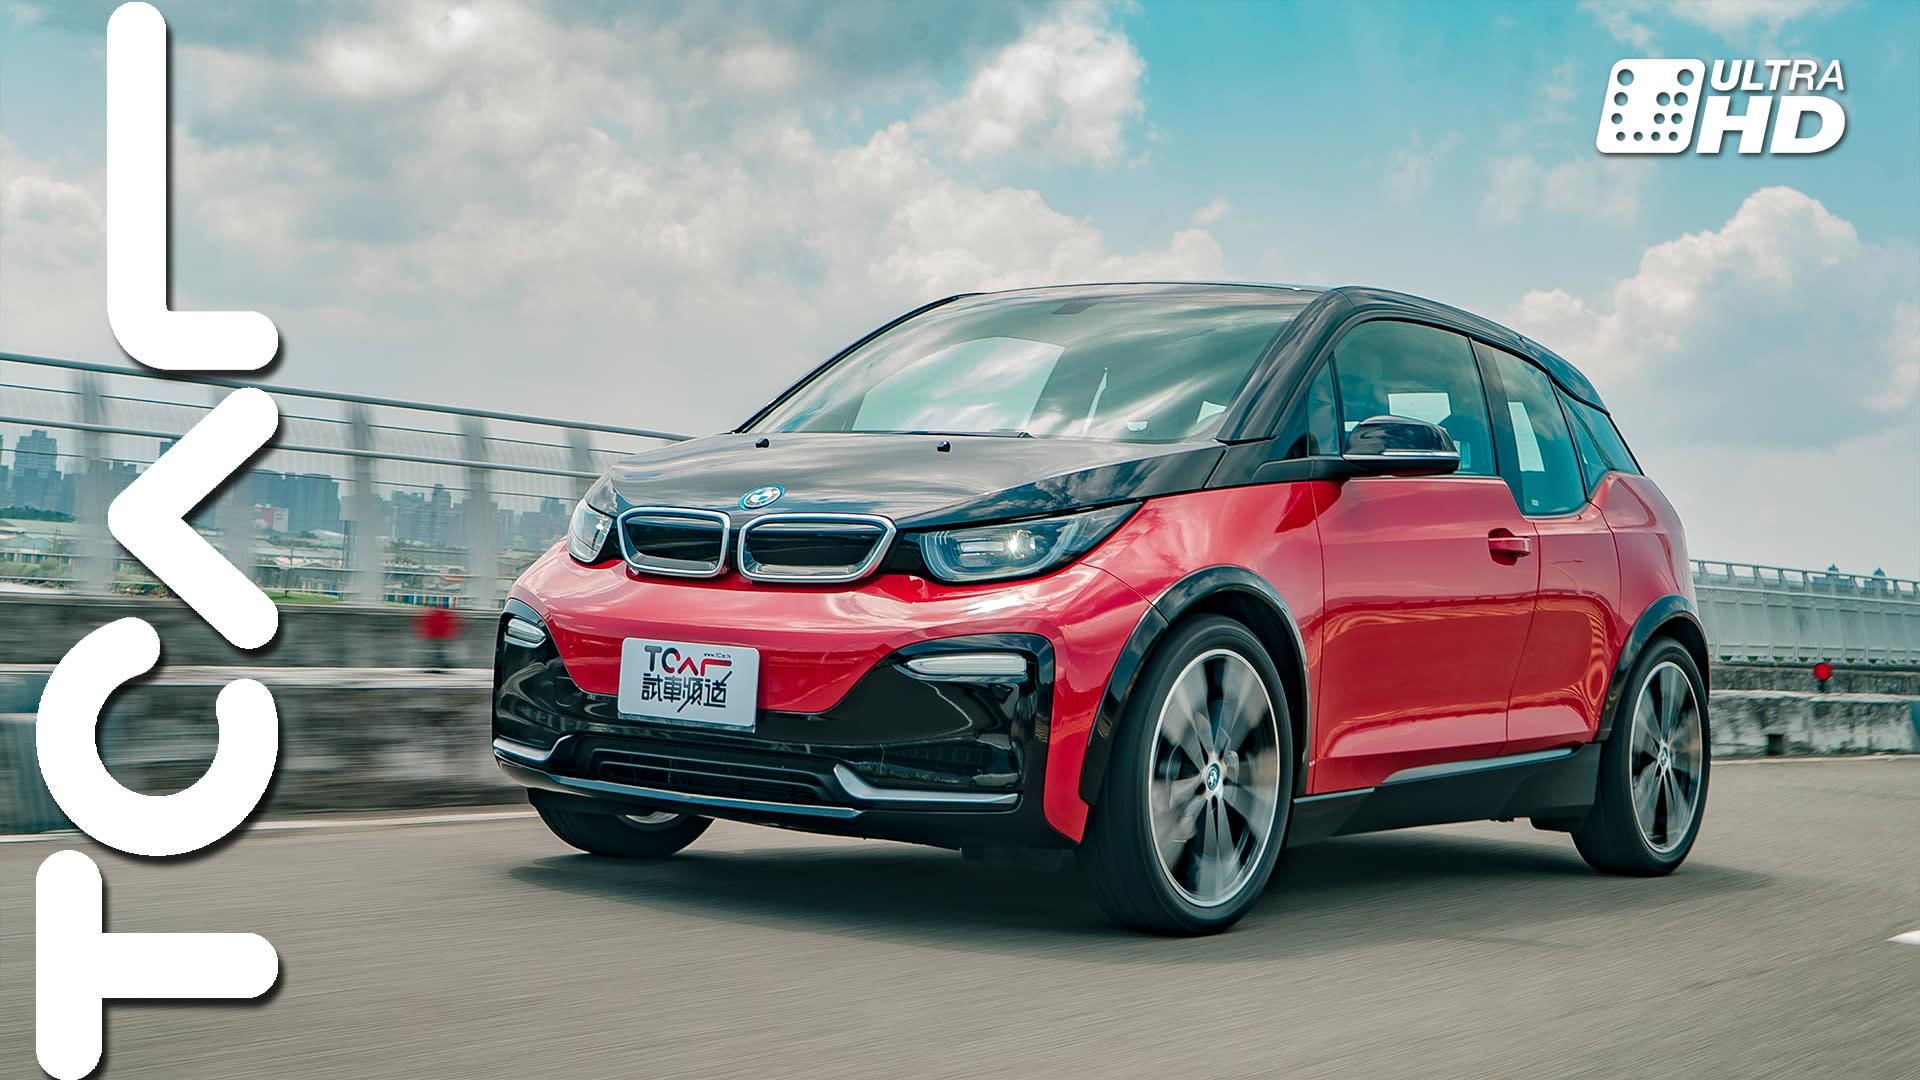 BMW i3s 電動小猛獸試駕、續航實測大考驗 新車試駕 - TCAR